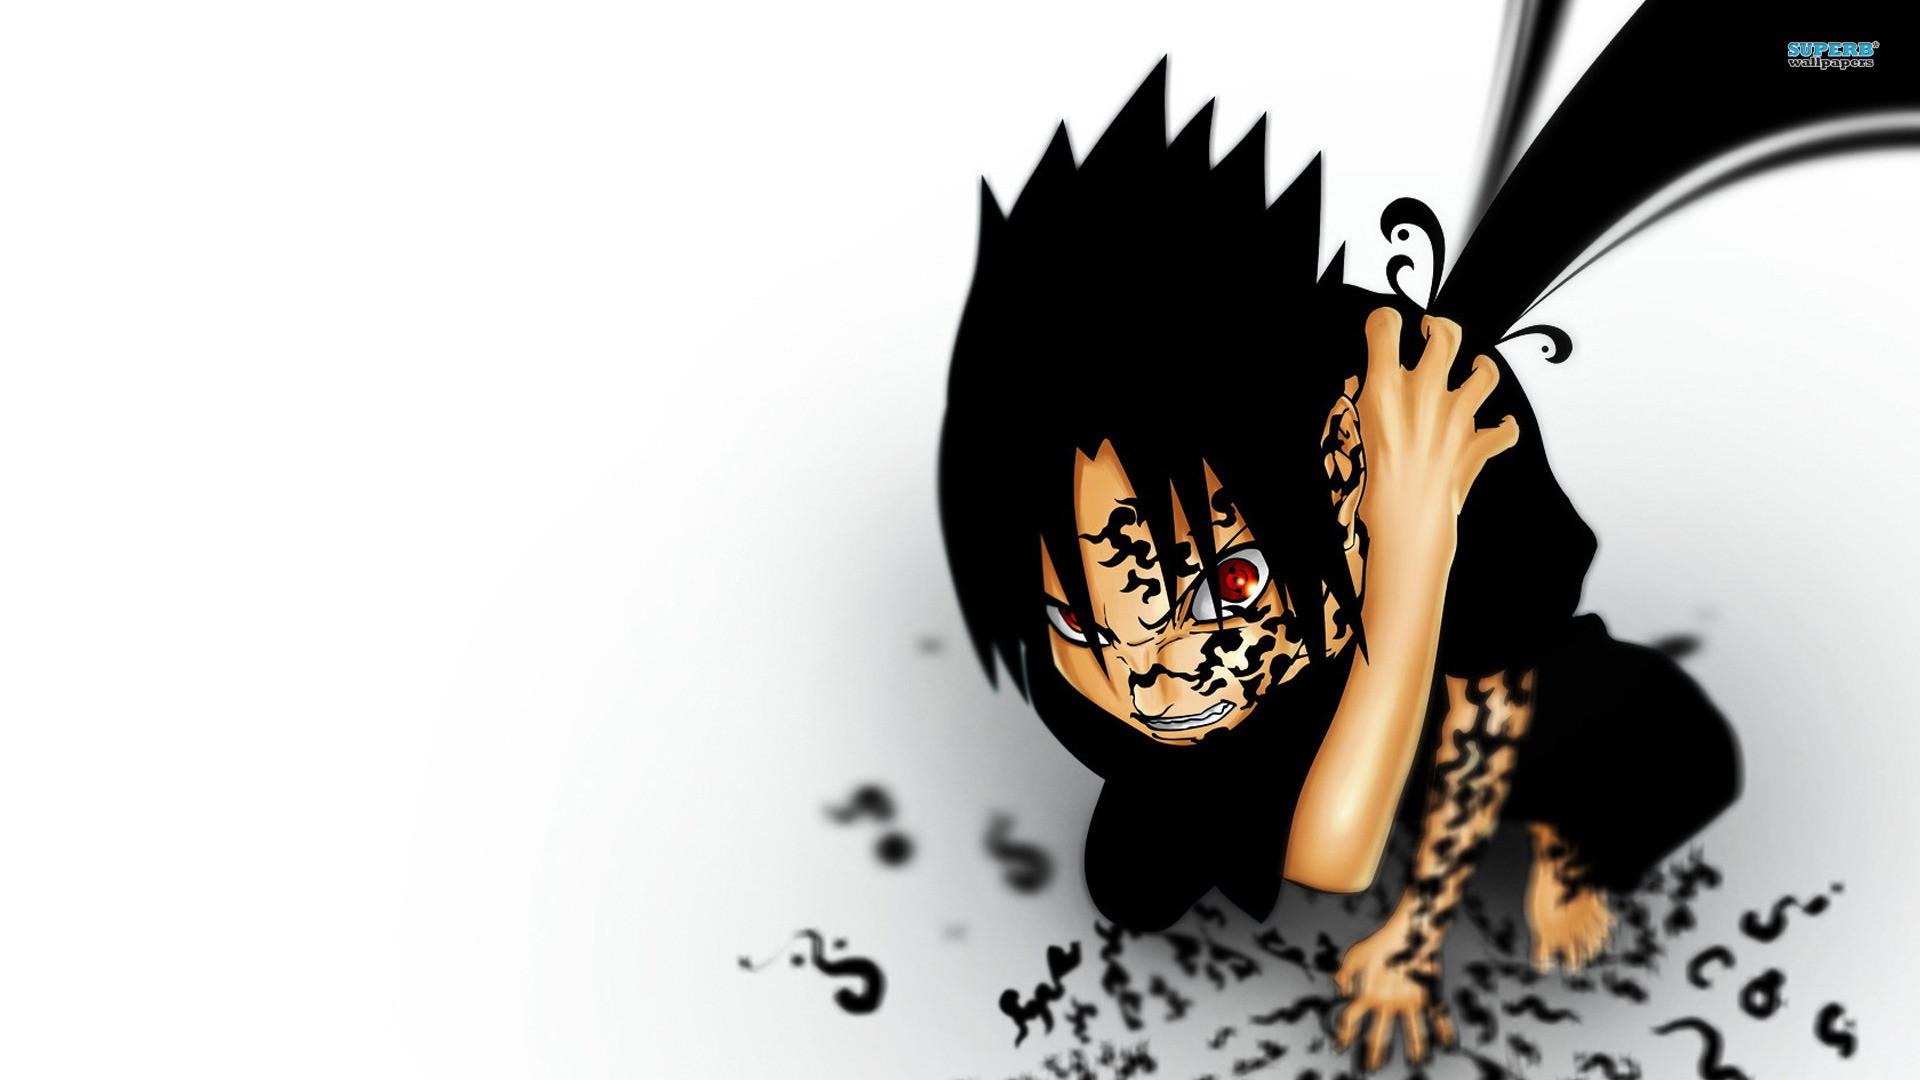 Wallpapers Sasuke Uchiha Naruto Anime 1920×1080